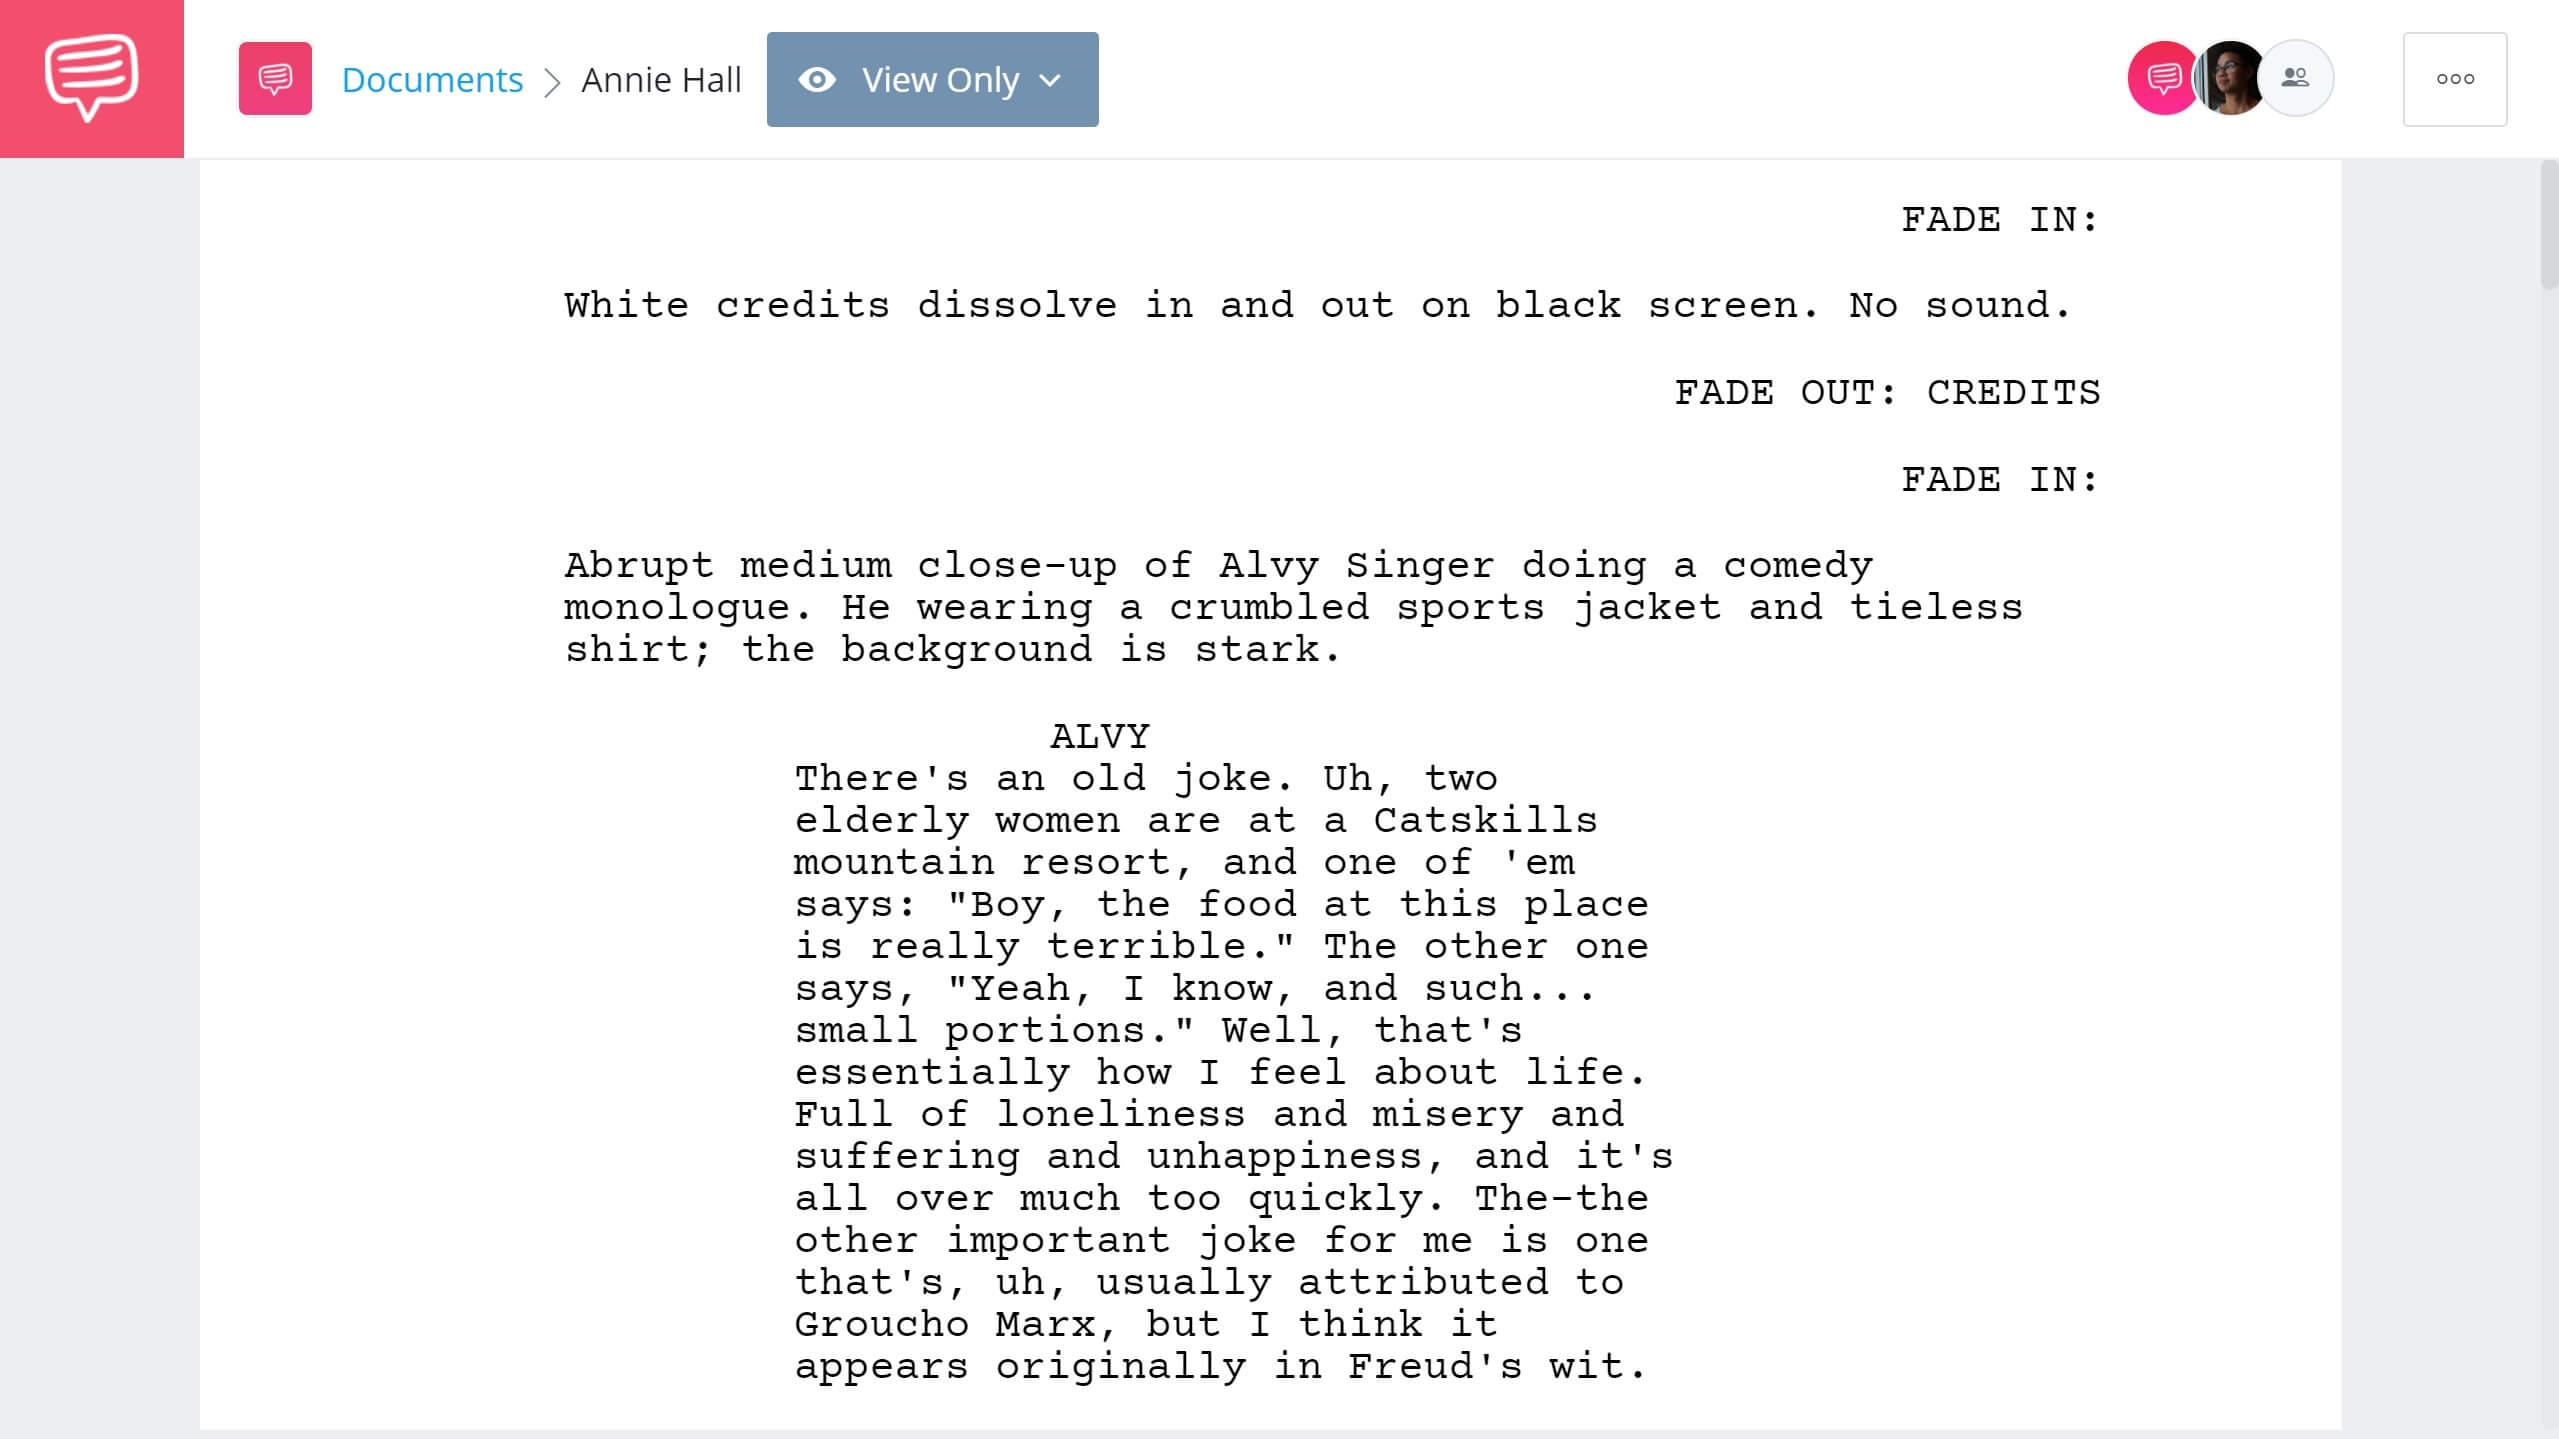 Best Original Screenplay Academy Award - Annie Hall Full Script PDF Download - StudioBinder Screenwriting Software